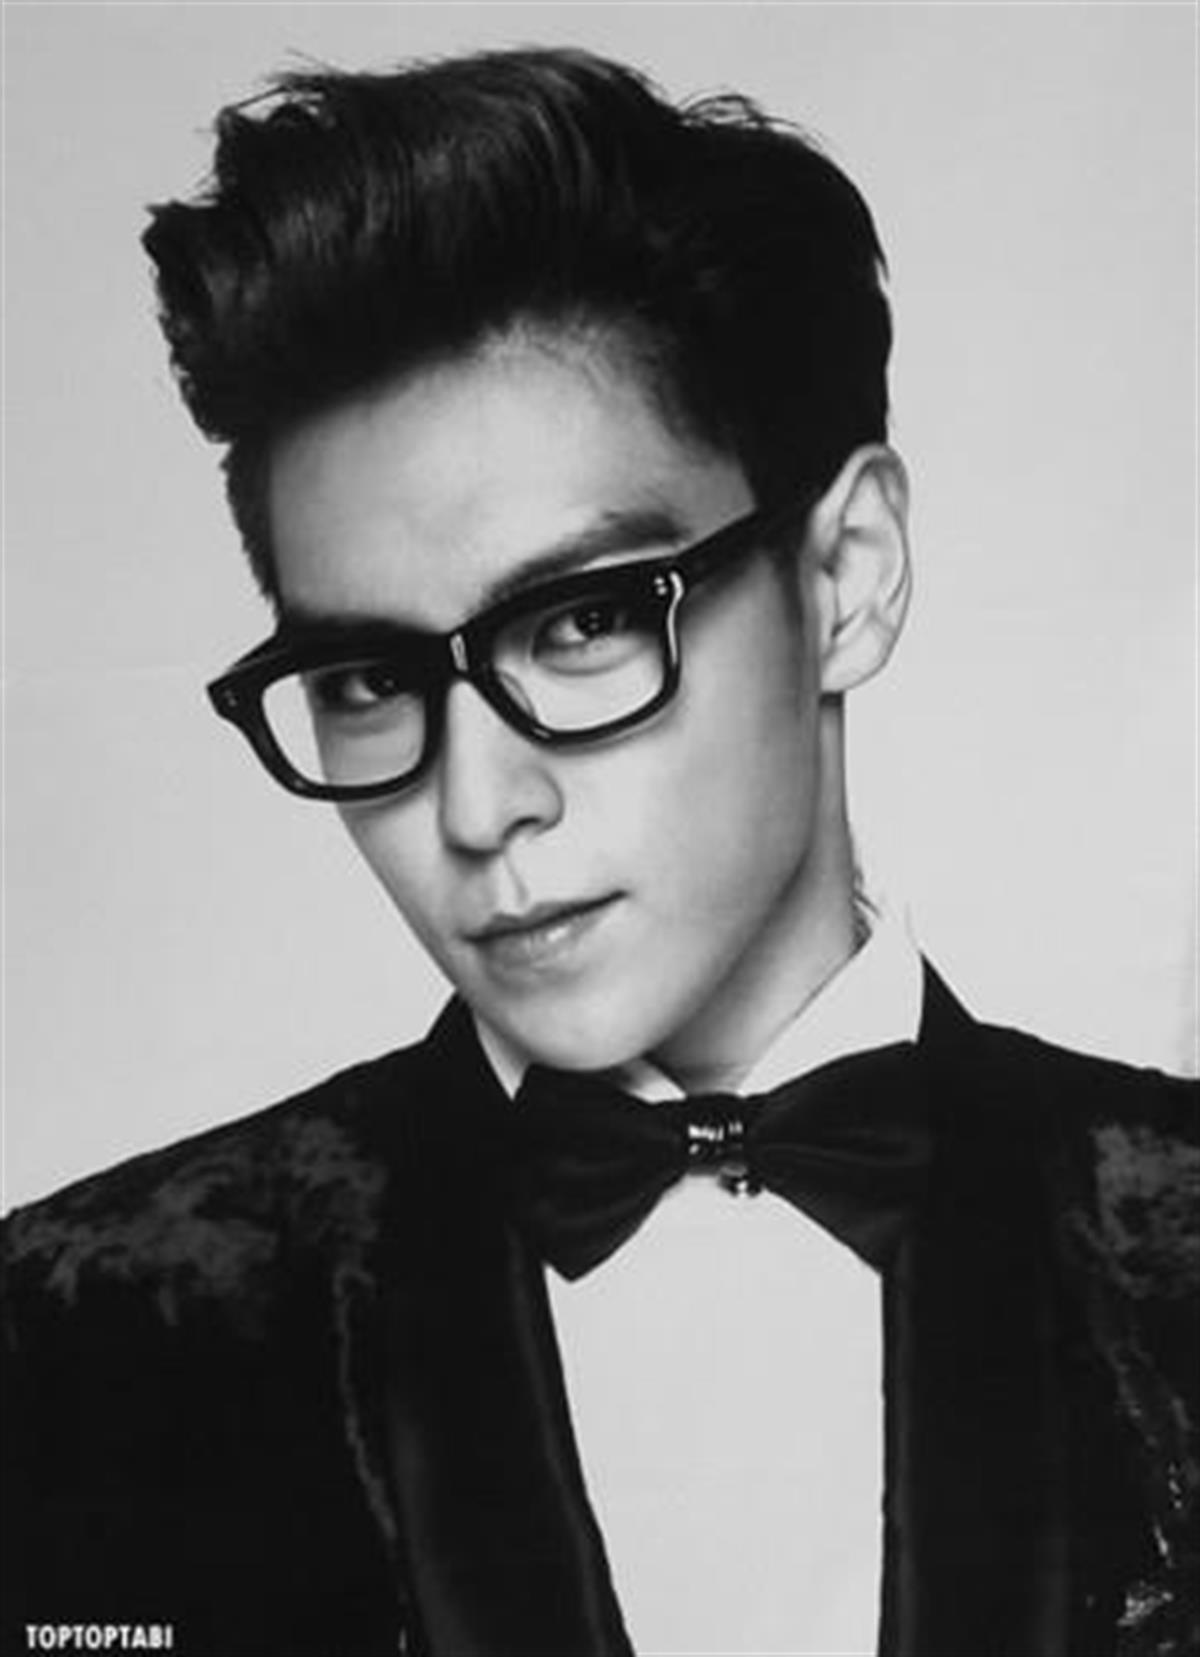 T.O.P glasses